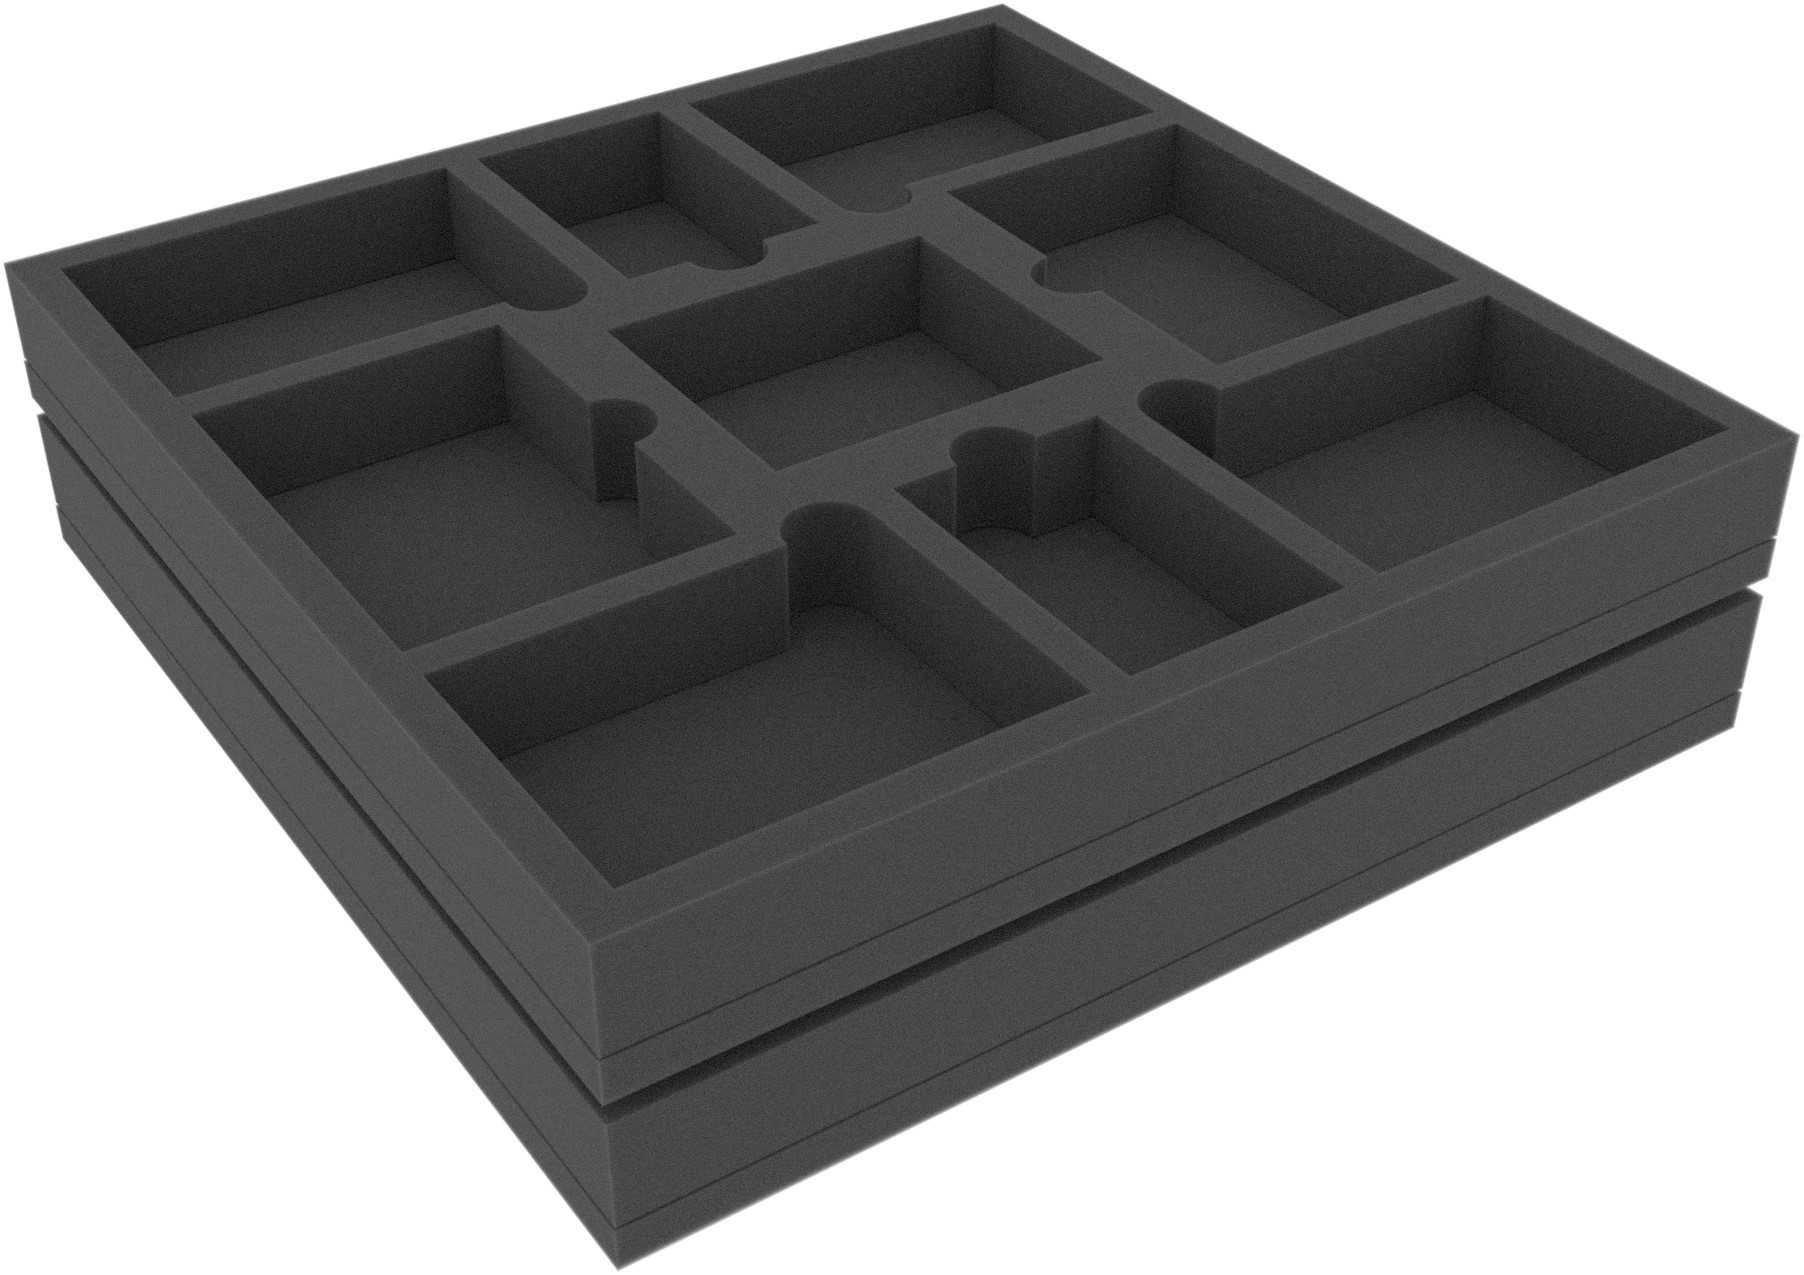 Feldherr Gąbka do This War of Mine board game box